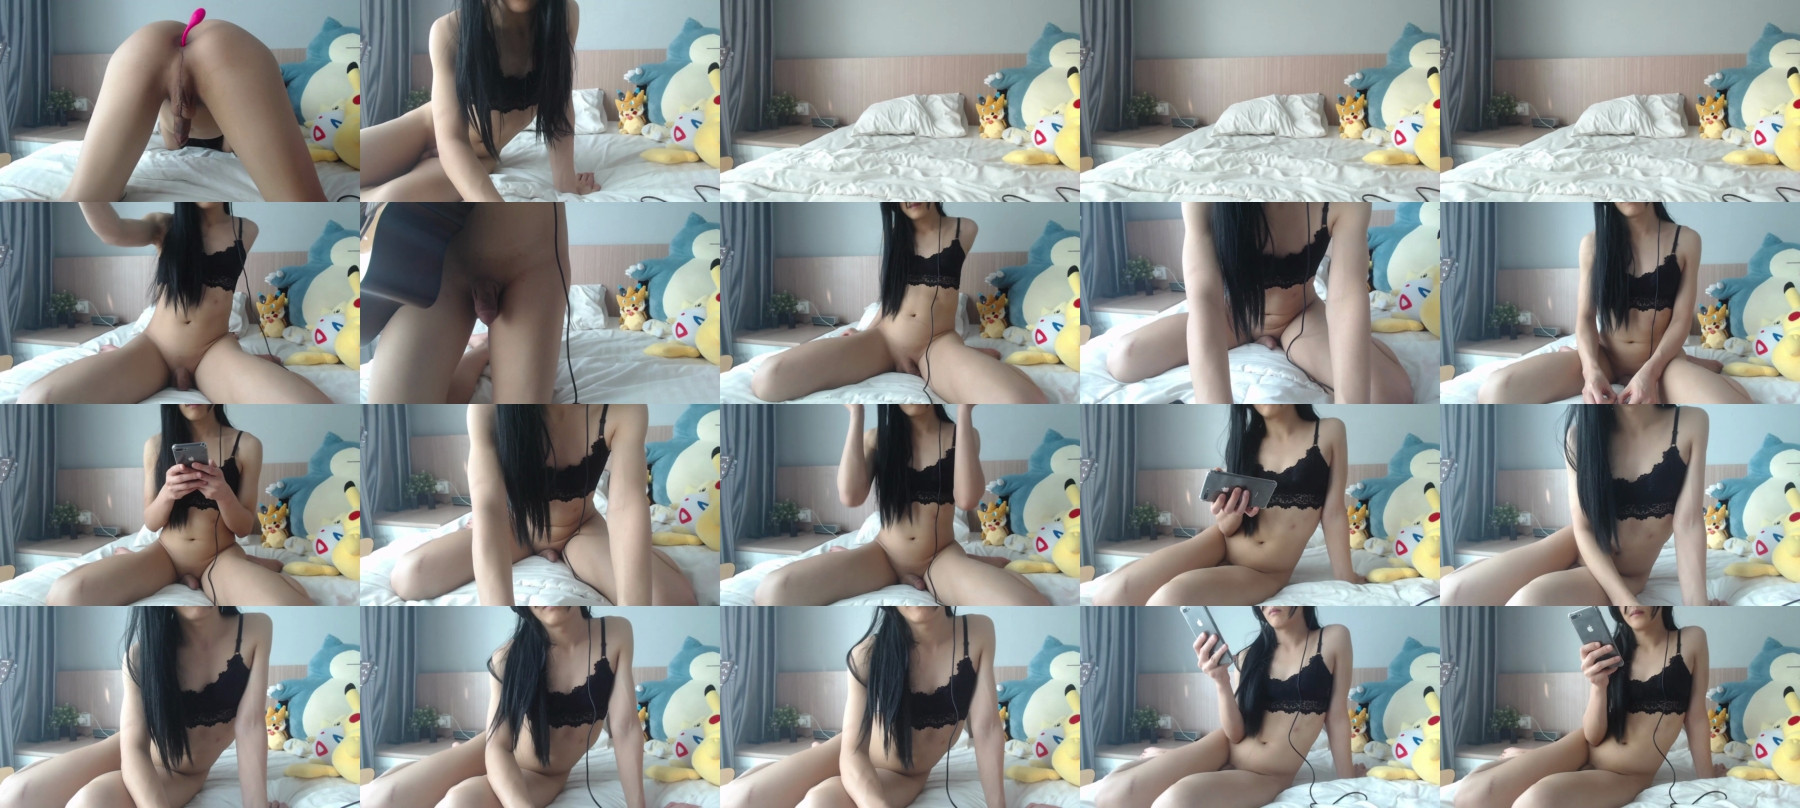 Loveypikachu Chaturbate 20-04-2021 Trans Naked